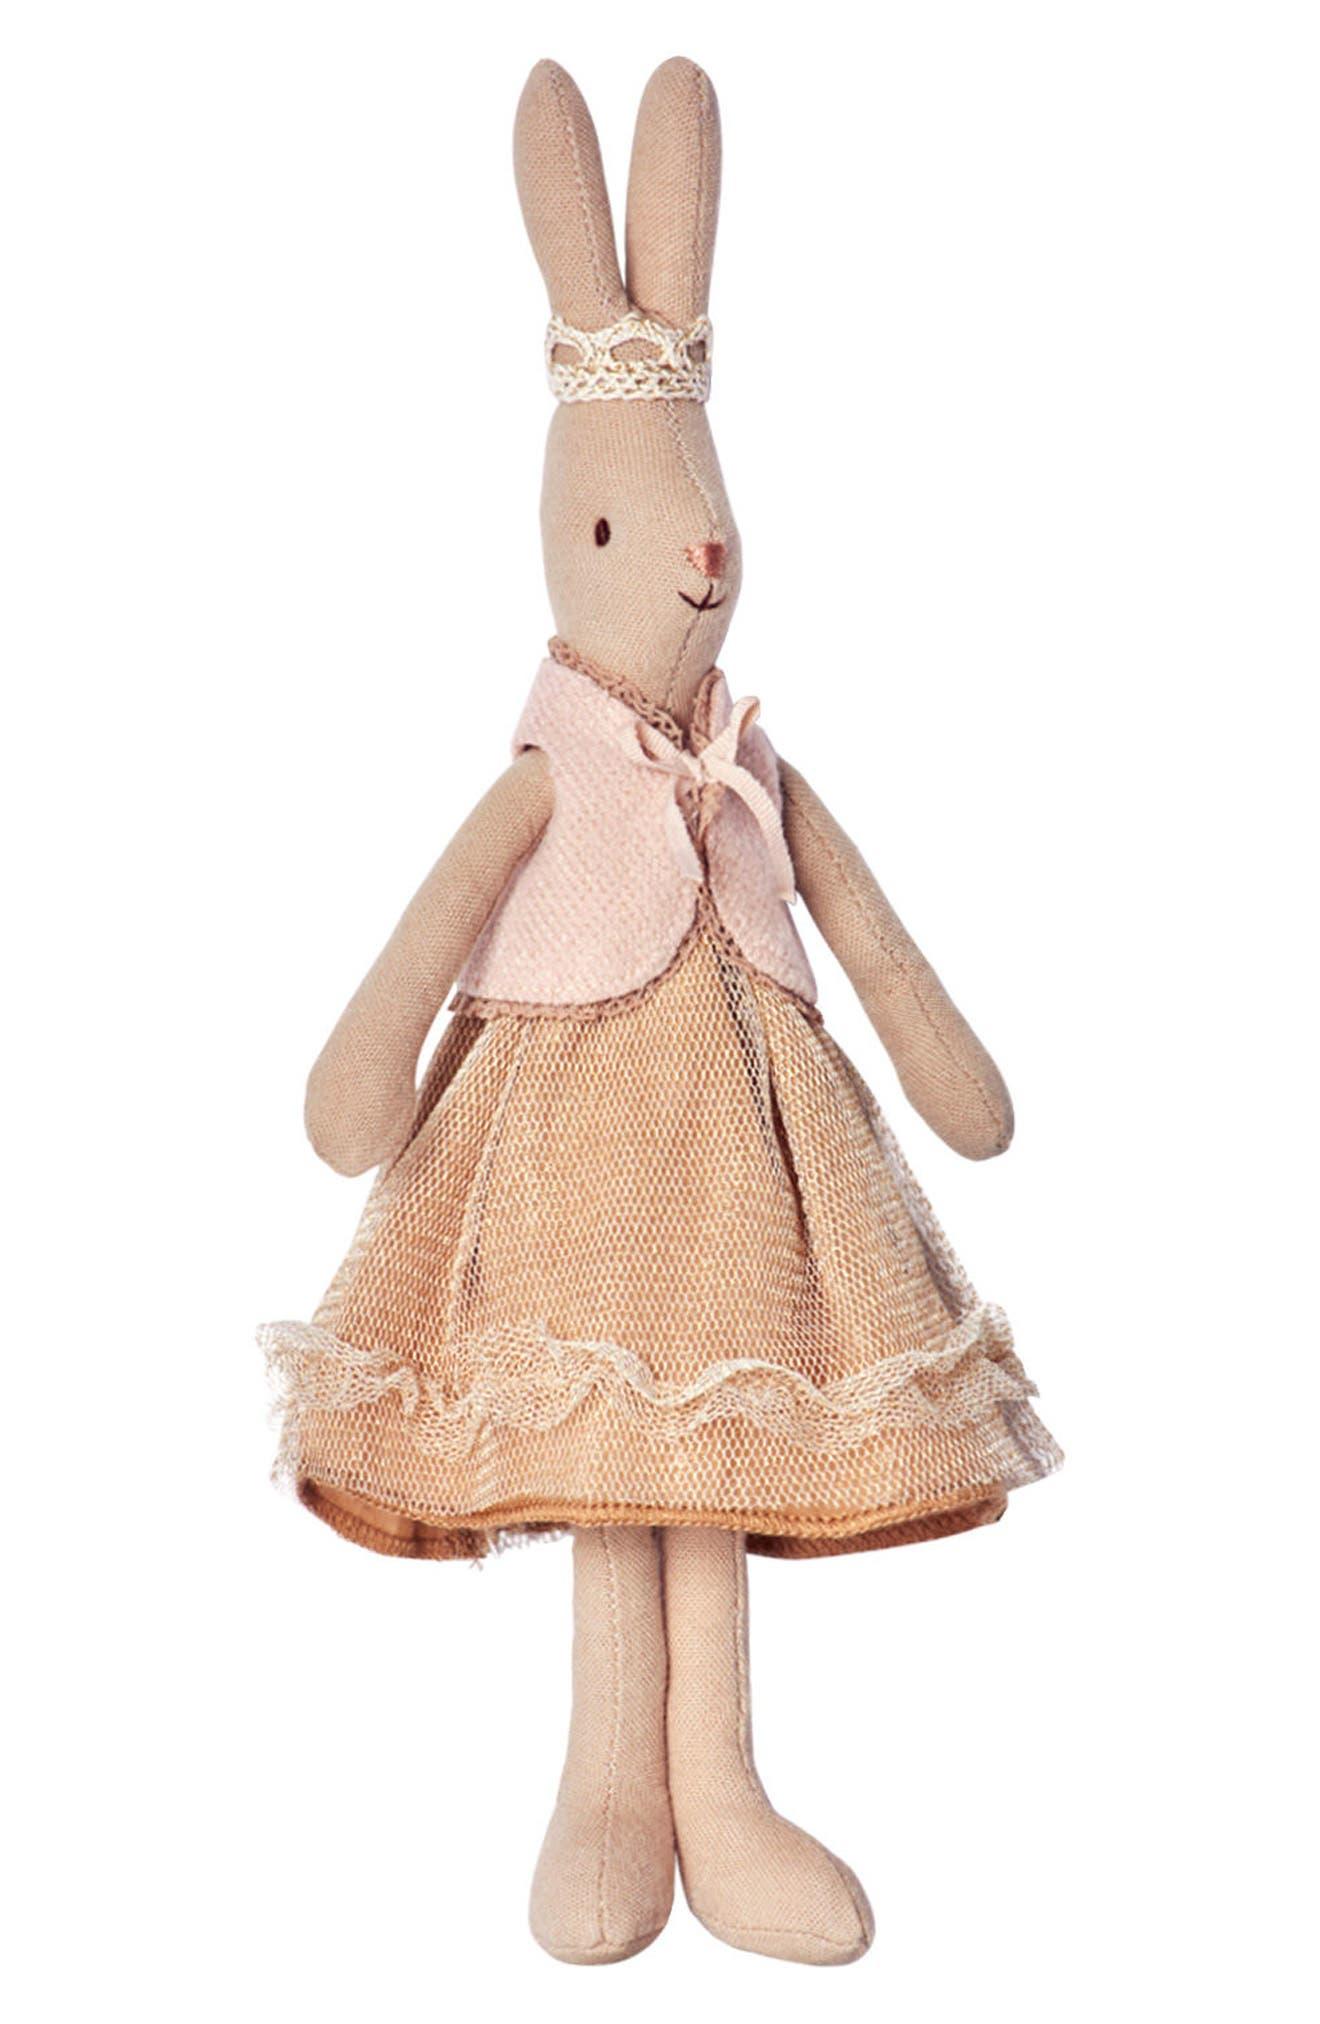 Mini Princess Flippa Stuffed Toy Bunny,                             Main thumbnail 1, color,                             250